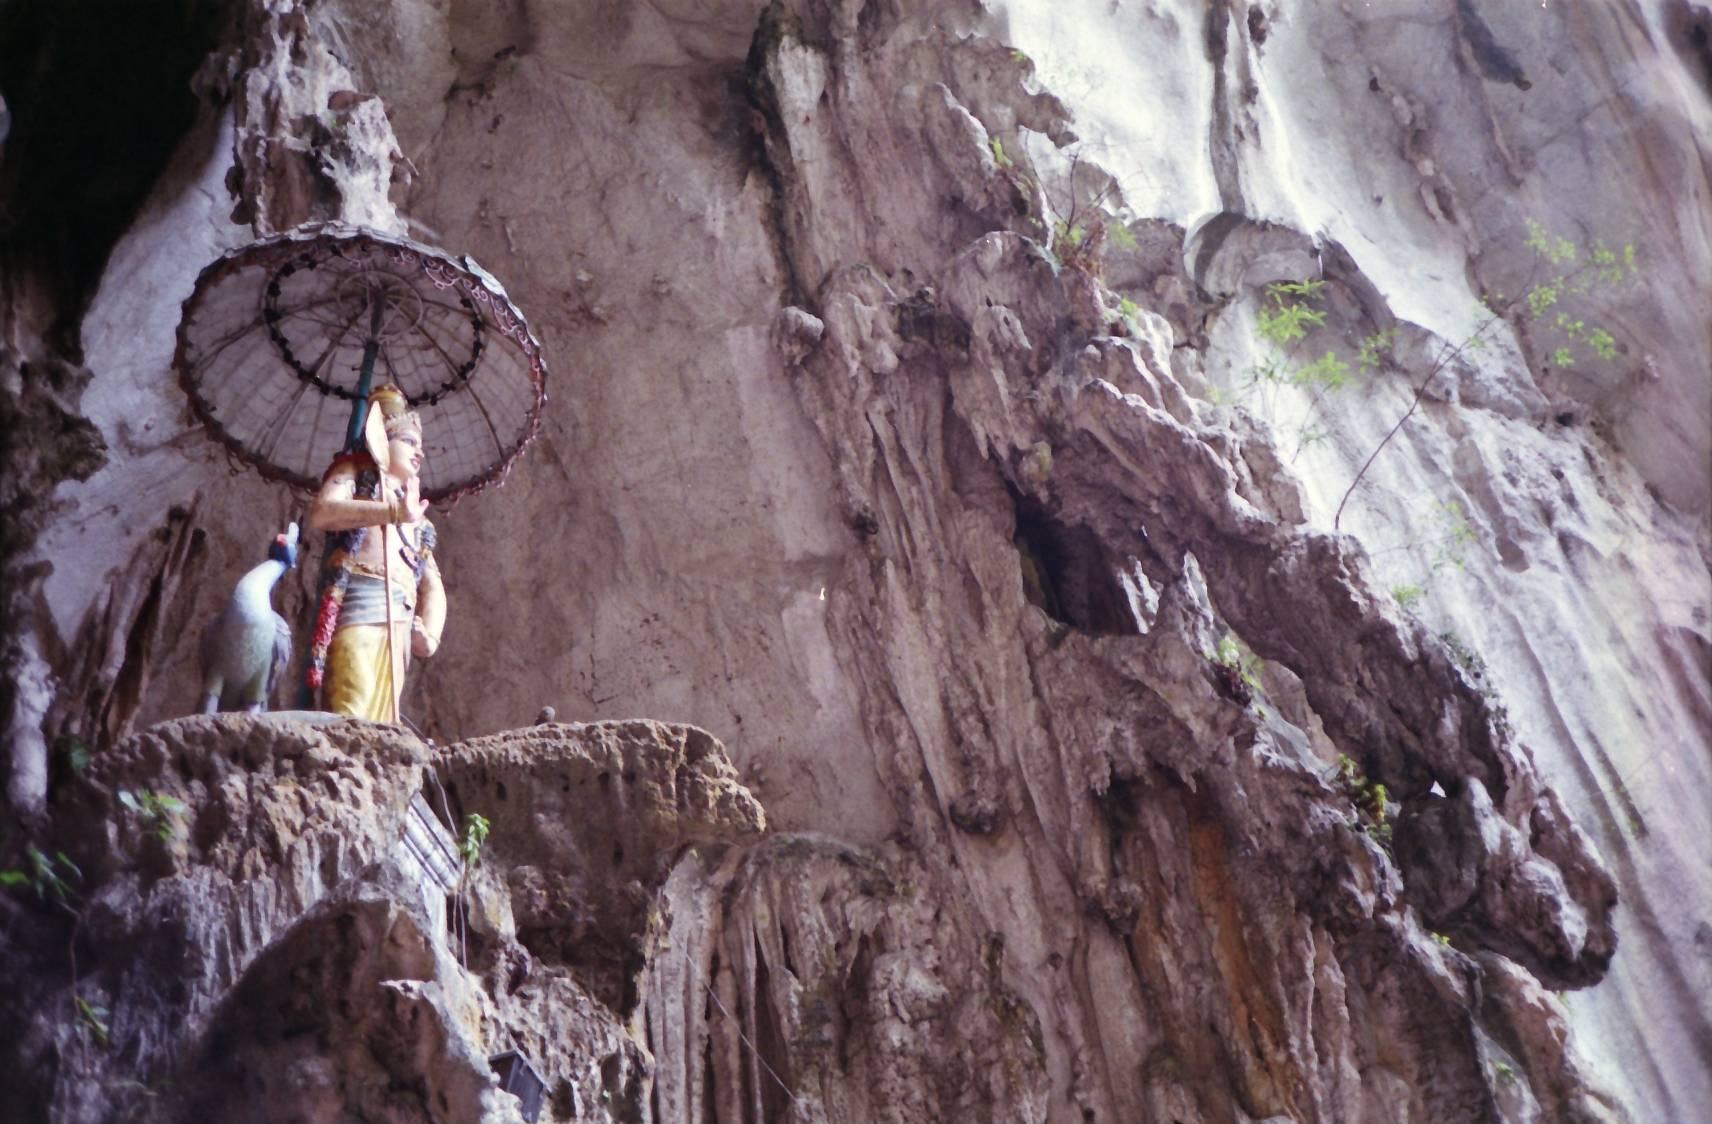 O melhor da Malásia - cavernas Batu, Kuala Lumpur